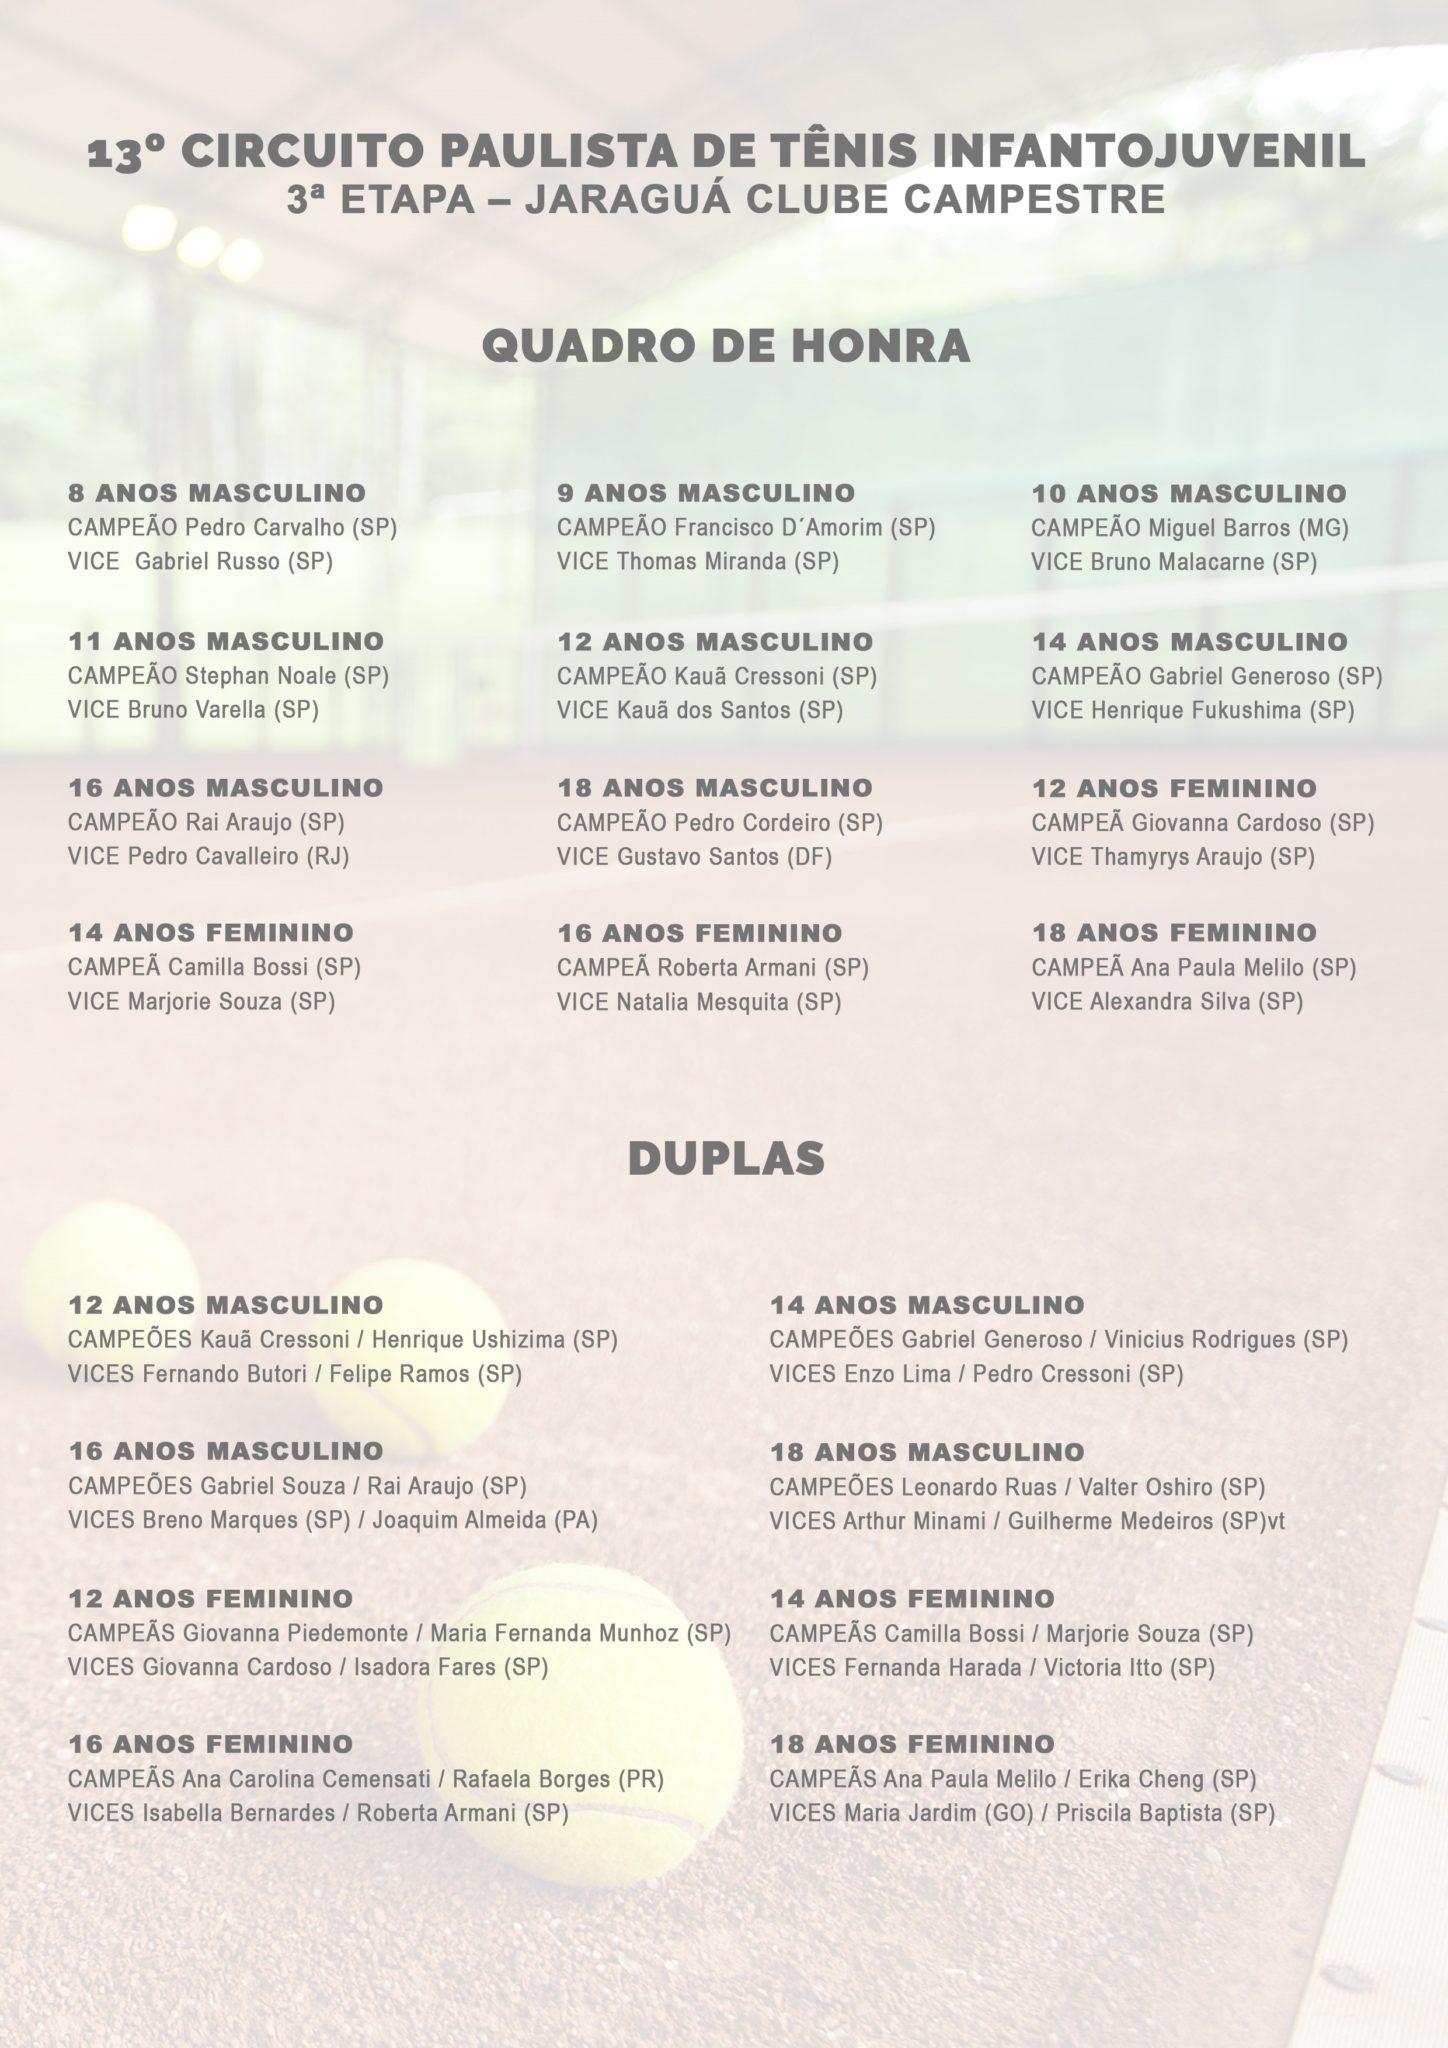 13º CIRCUITO PAULISTA DE TÊNIS INFANTOJUVENIL 3ª ETAPA – JARAGUÁ CLUBE CAMPESTRE